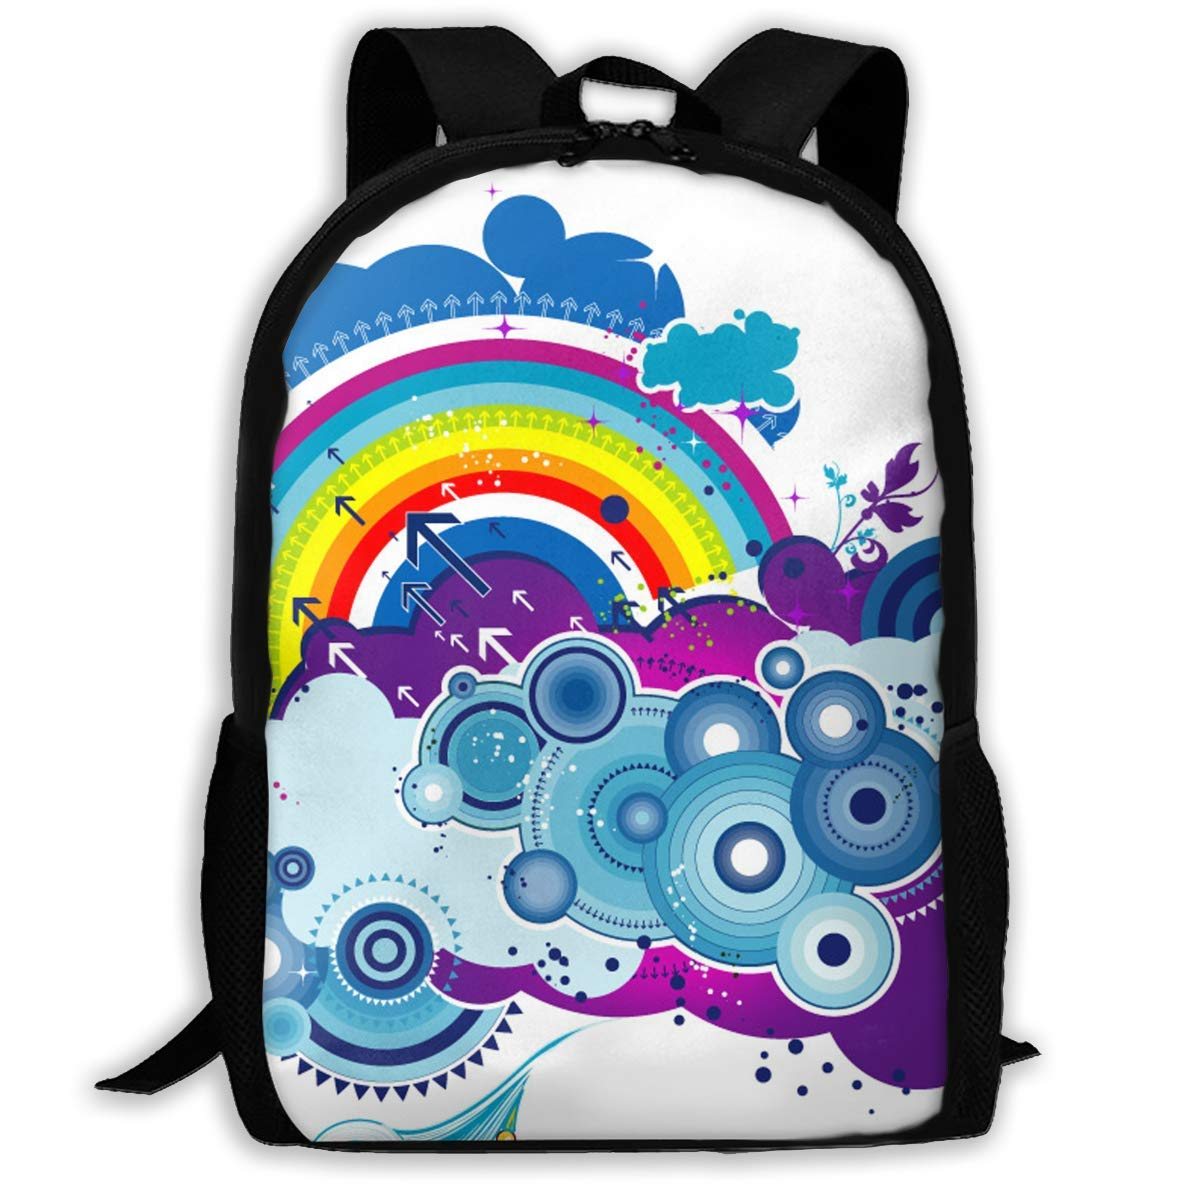 uhfgyhuihjf School Backpack Travel Hiking School Bags/Rainbow for Adult